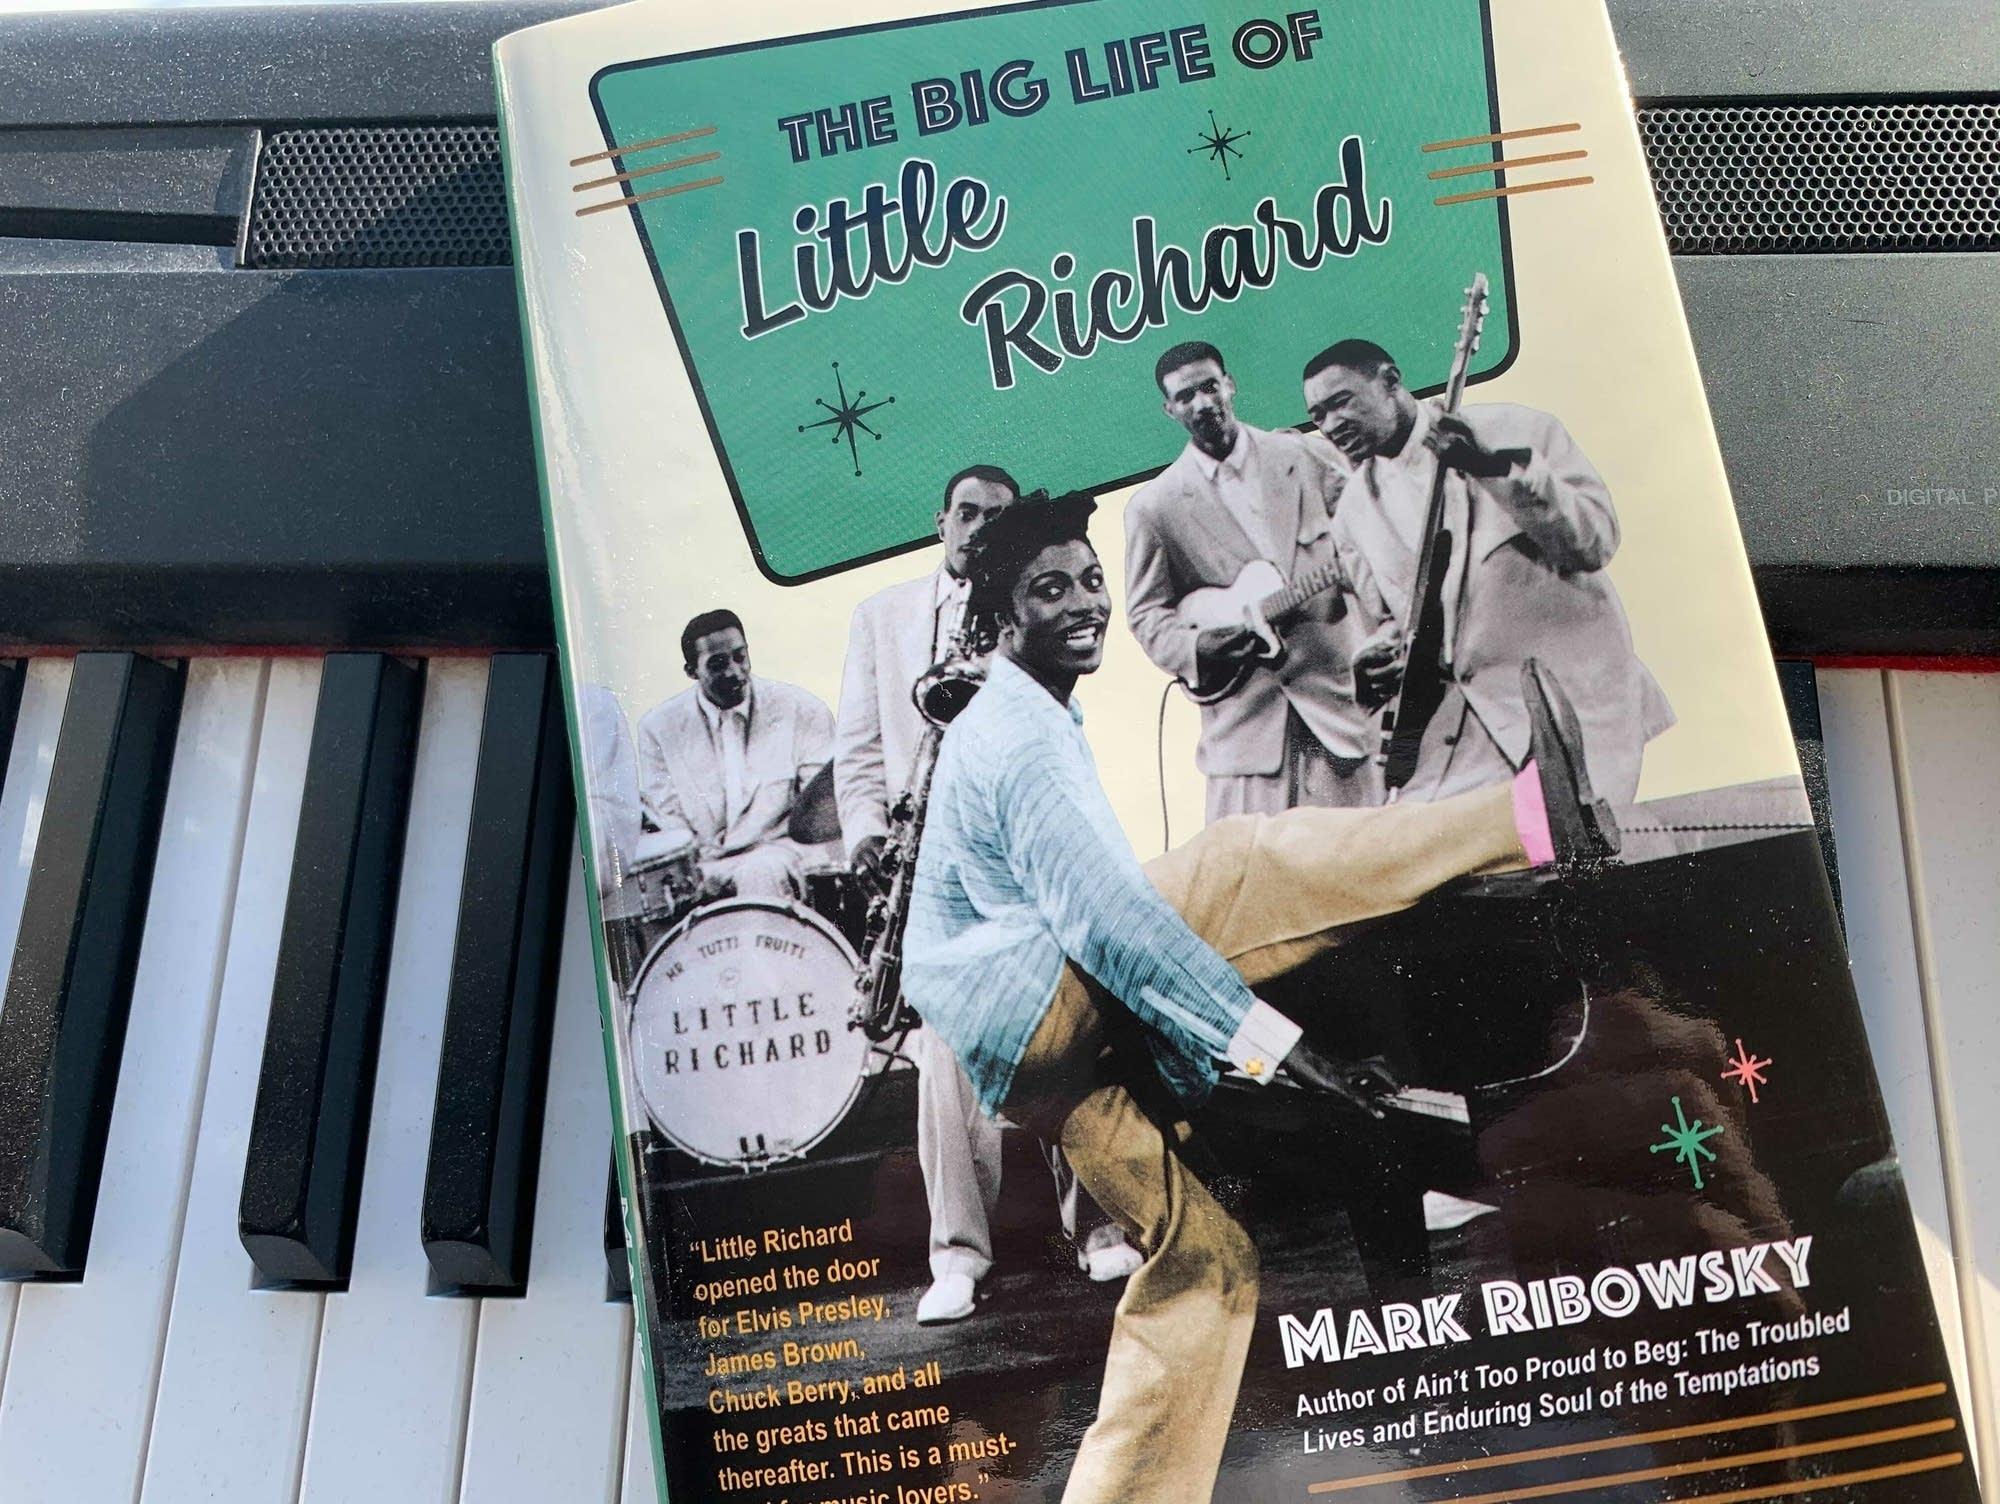 'The Big Life of Little Richard.'